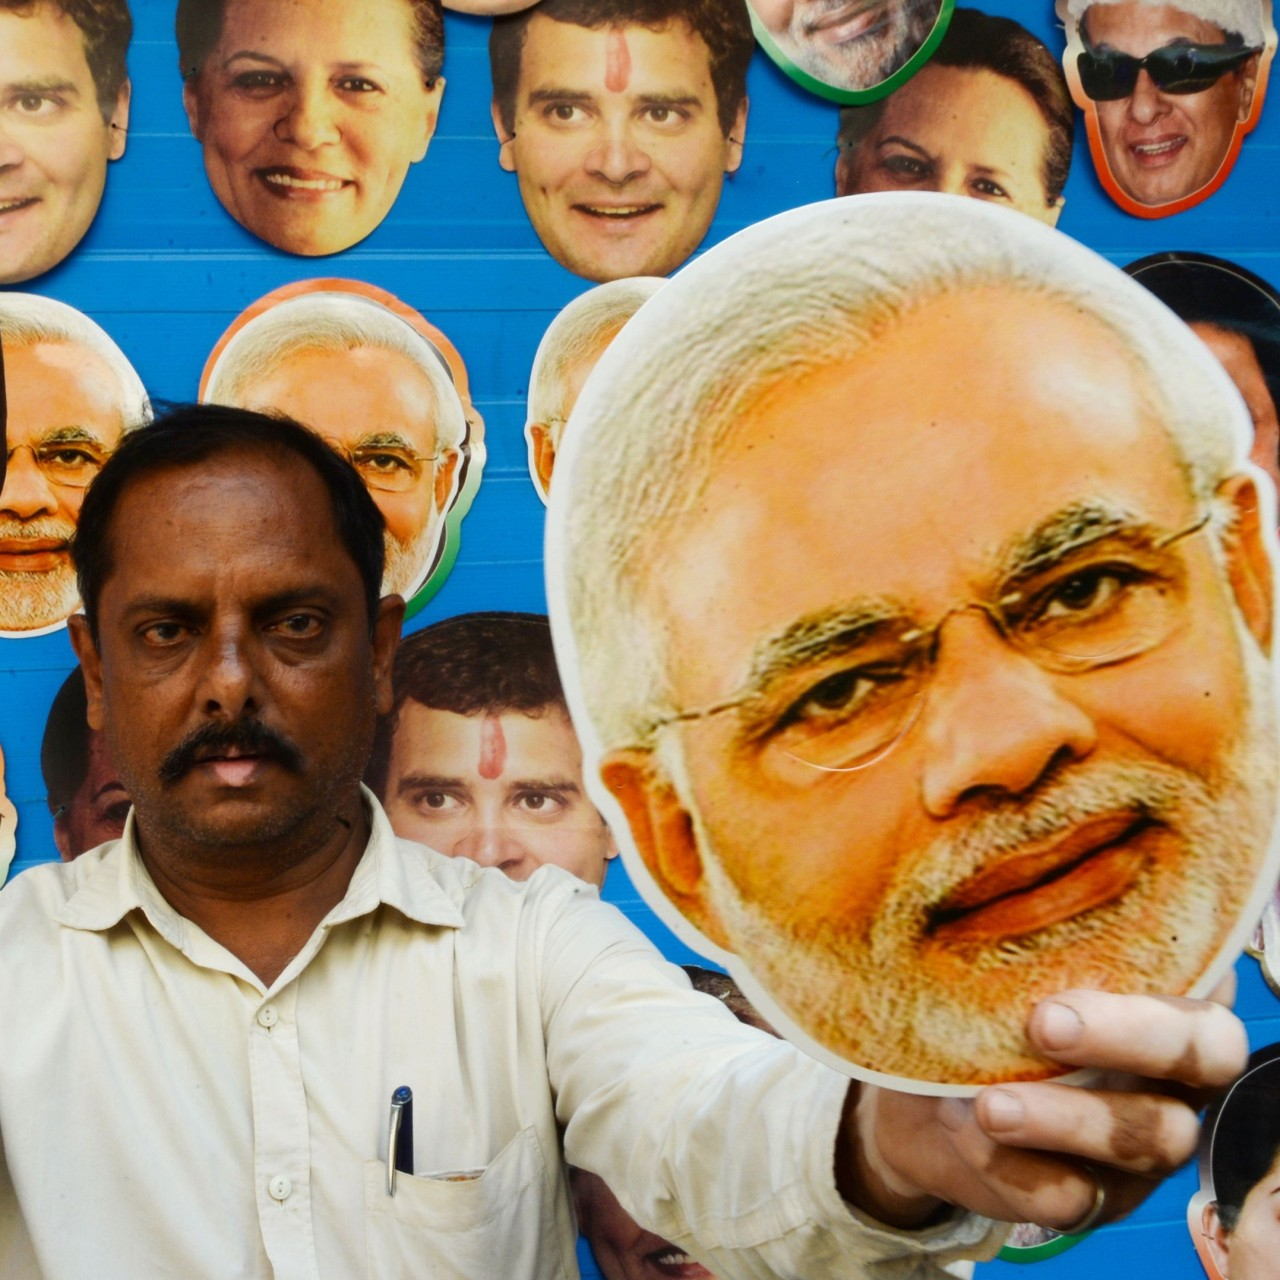 Gandhi to cow vigilantes, fake news and 'watchman' Modi: India's